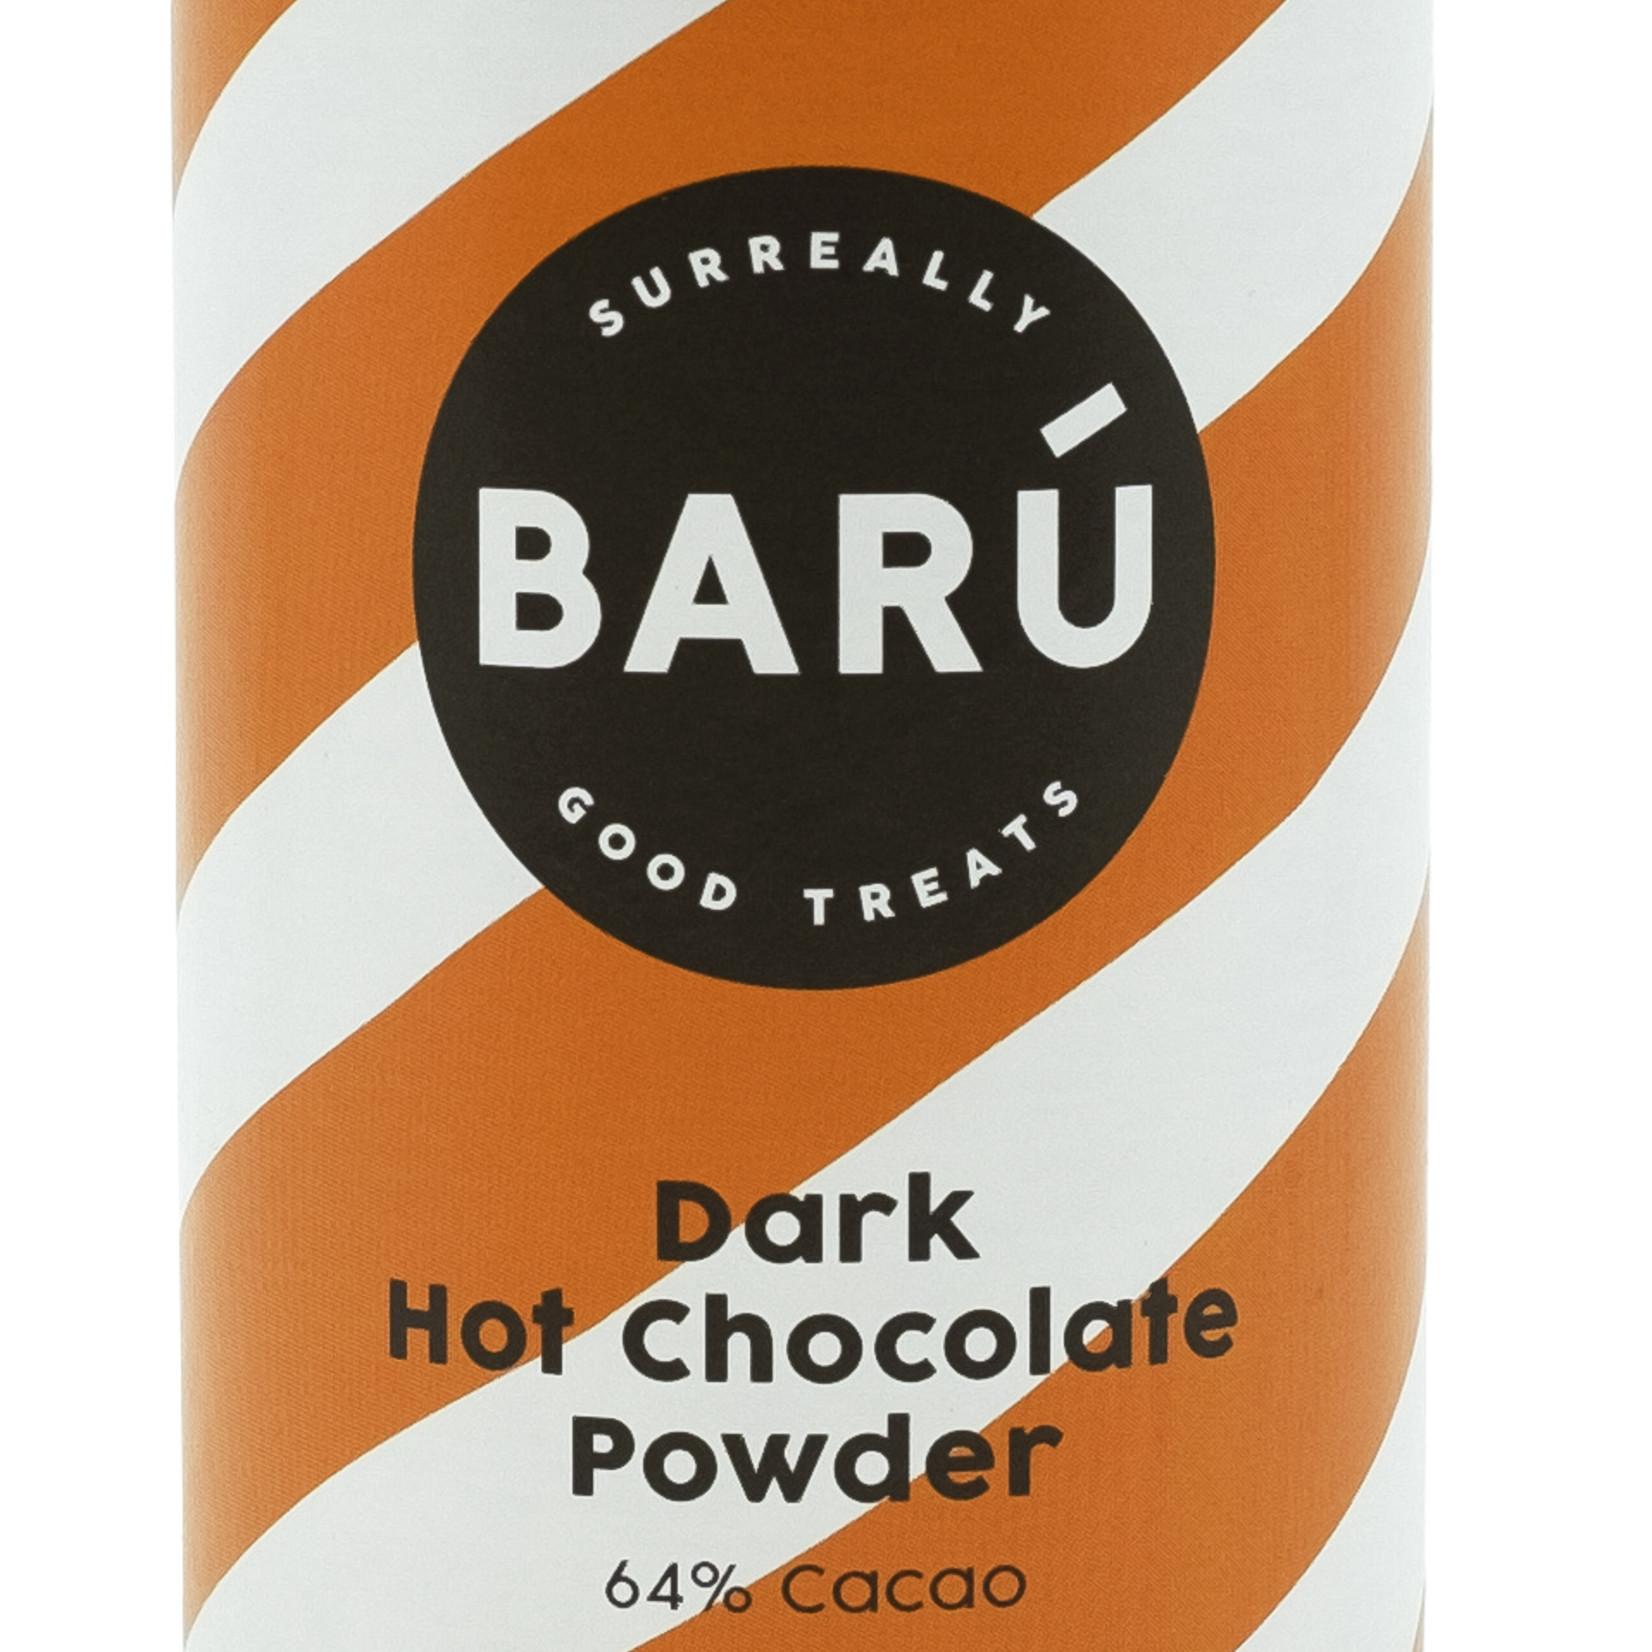 Barú Dark Hot Chocolate Powder